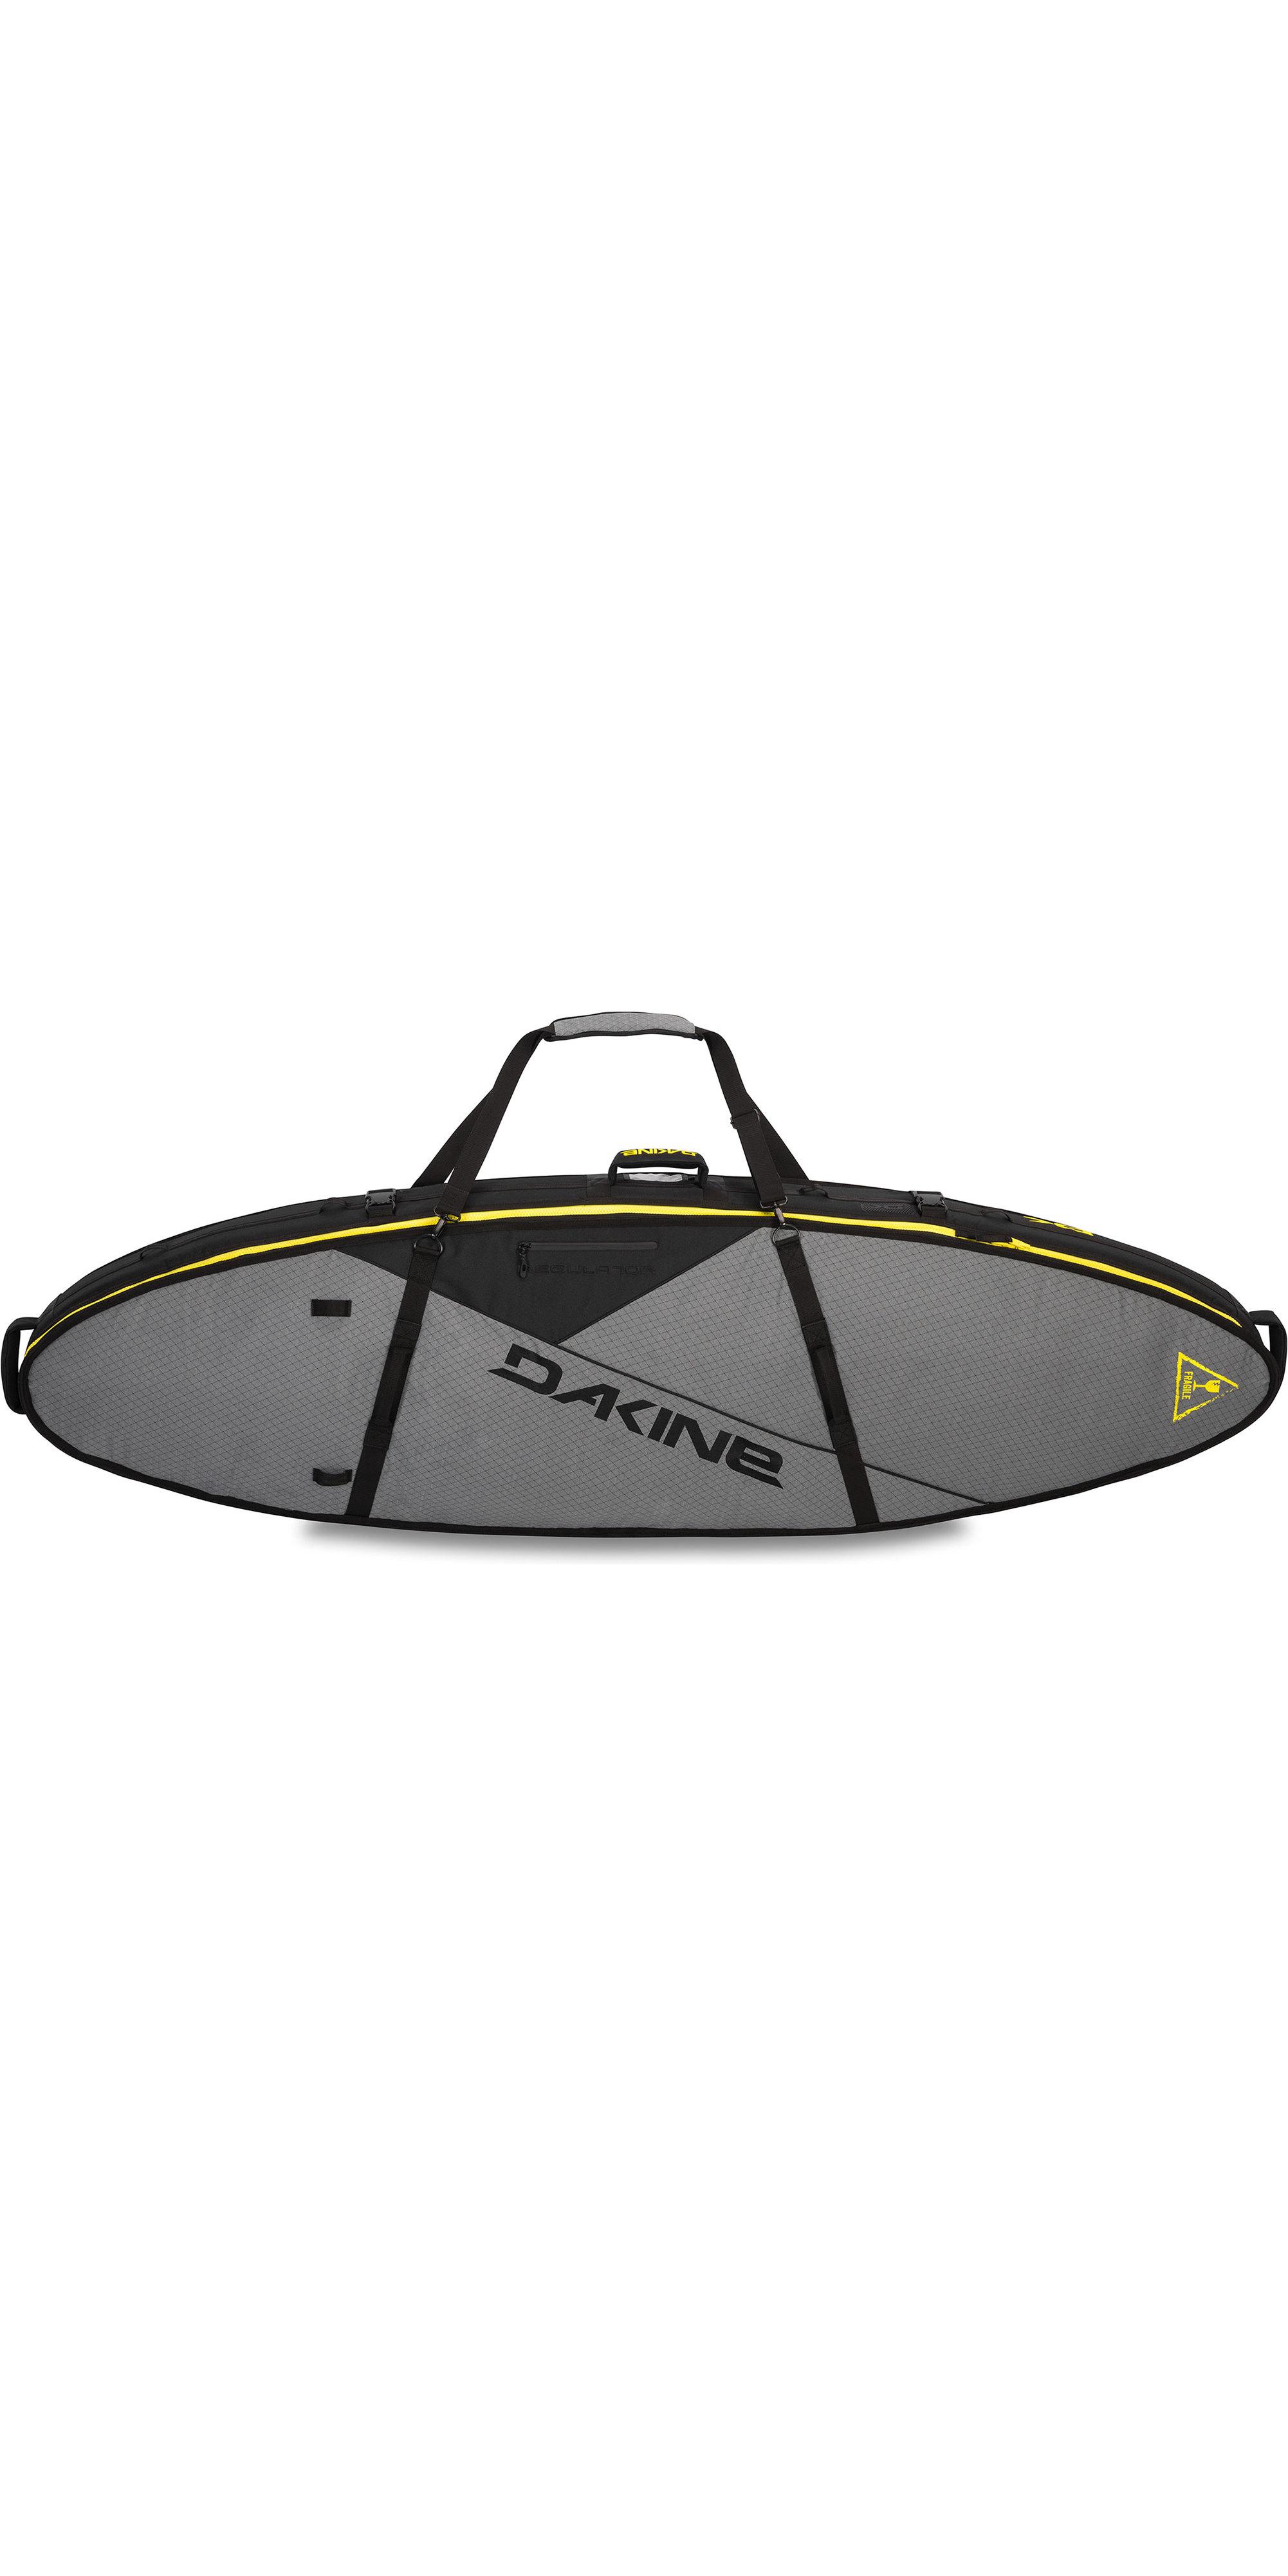 2019 Dakine Regulator Triple Surfboard Bag 7'0 Carbon 10002308